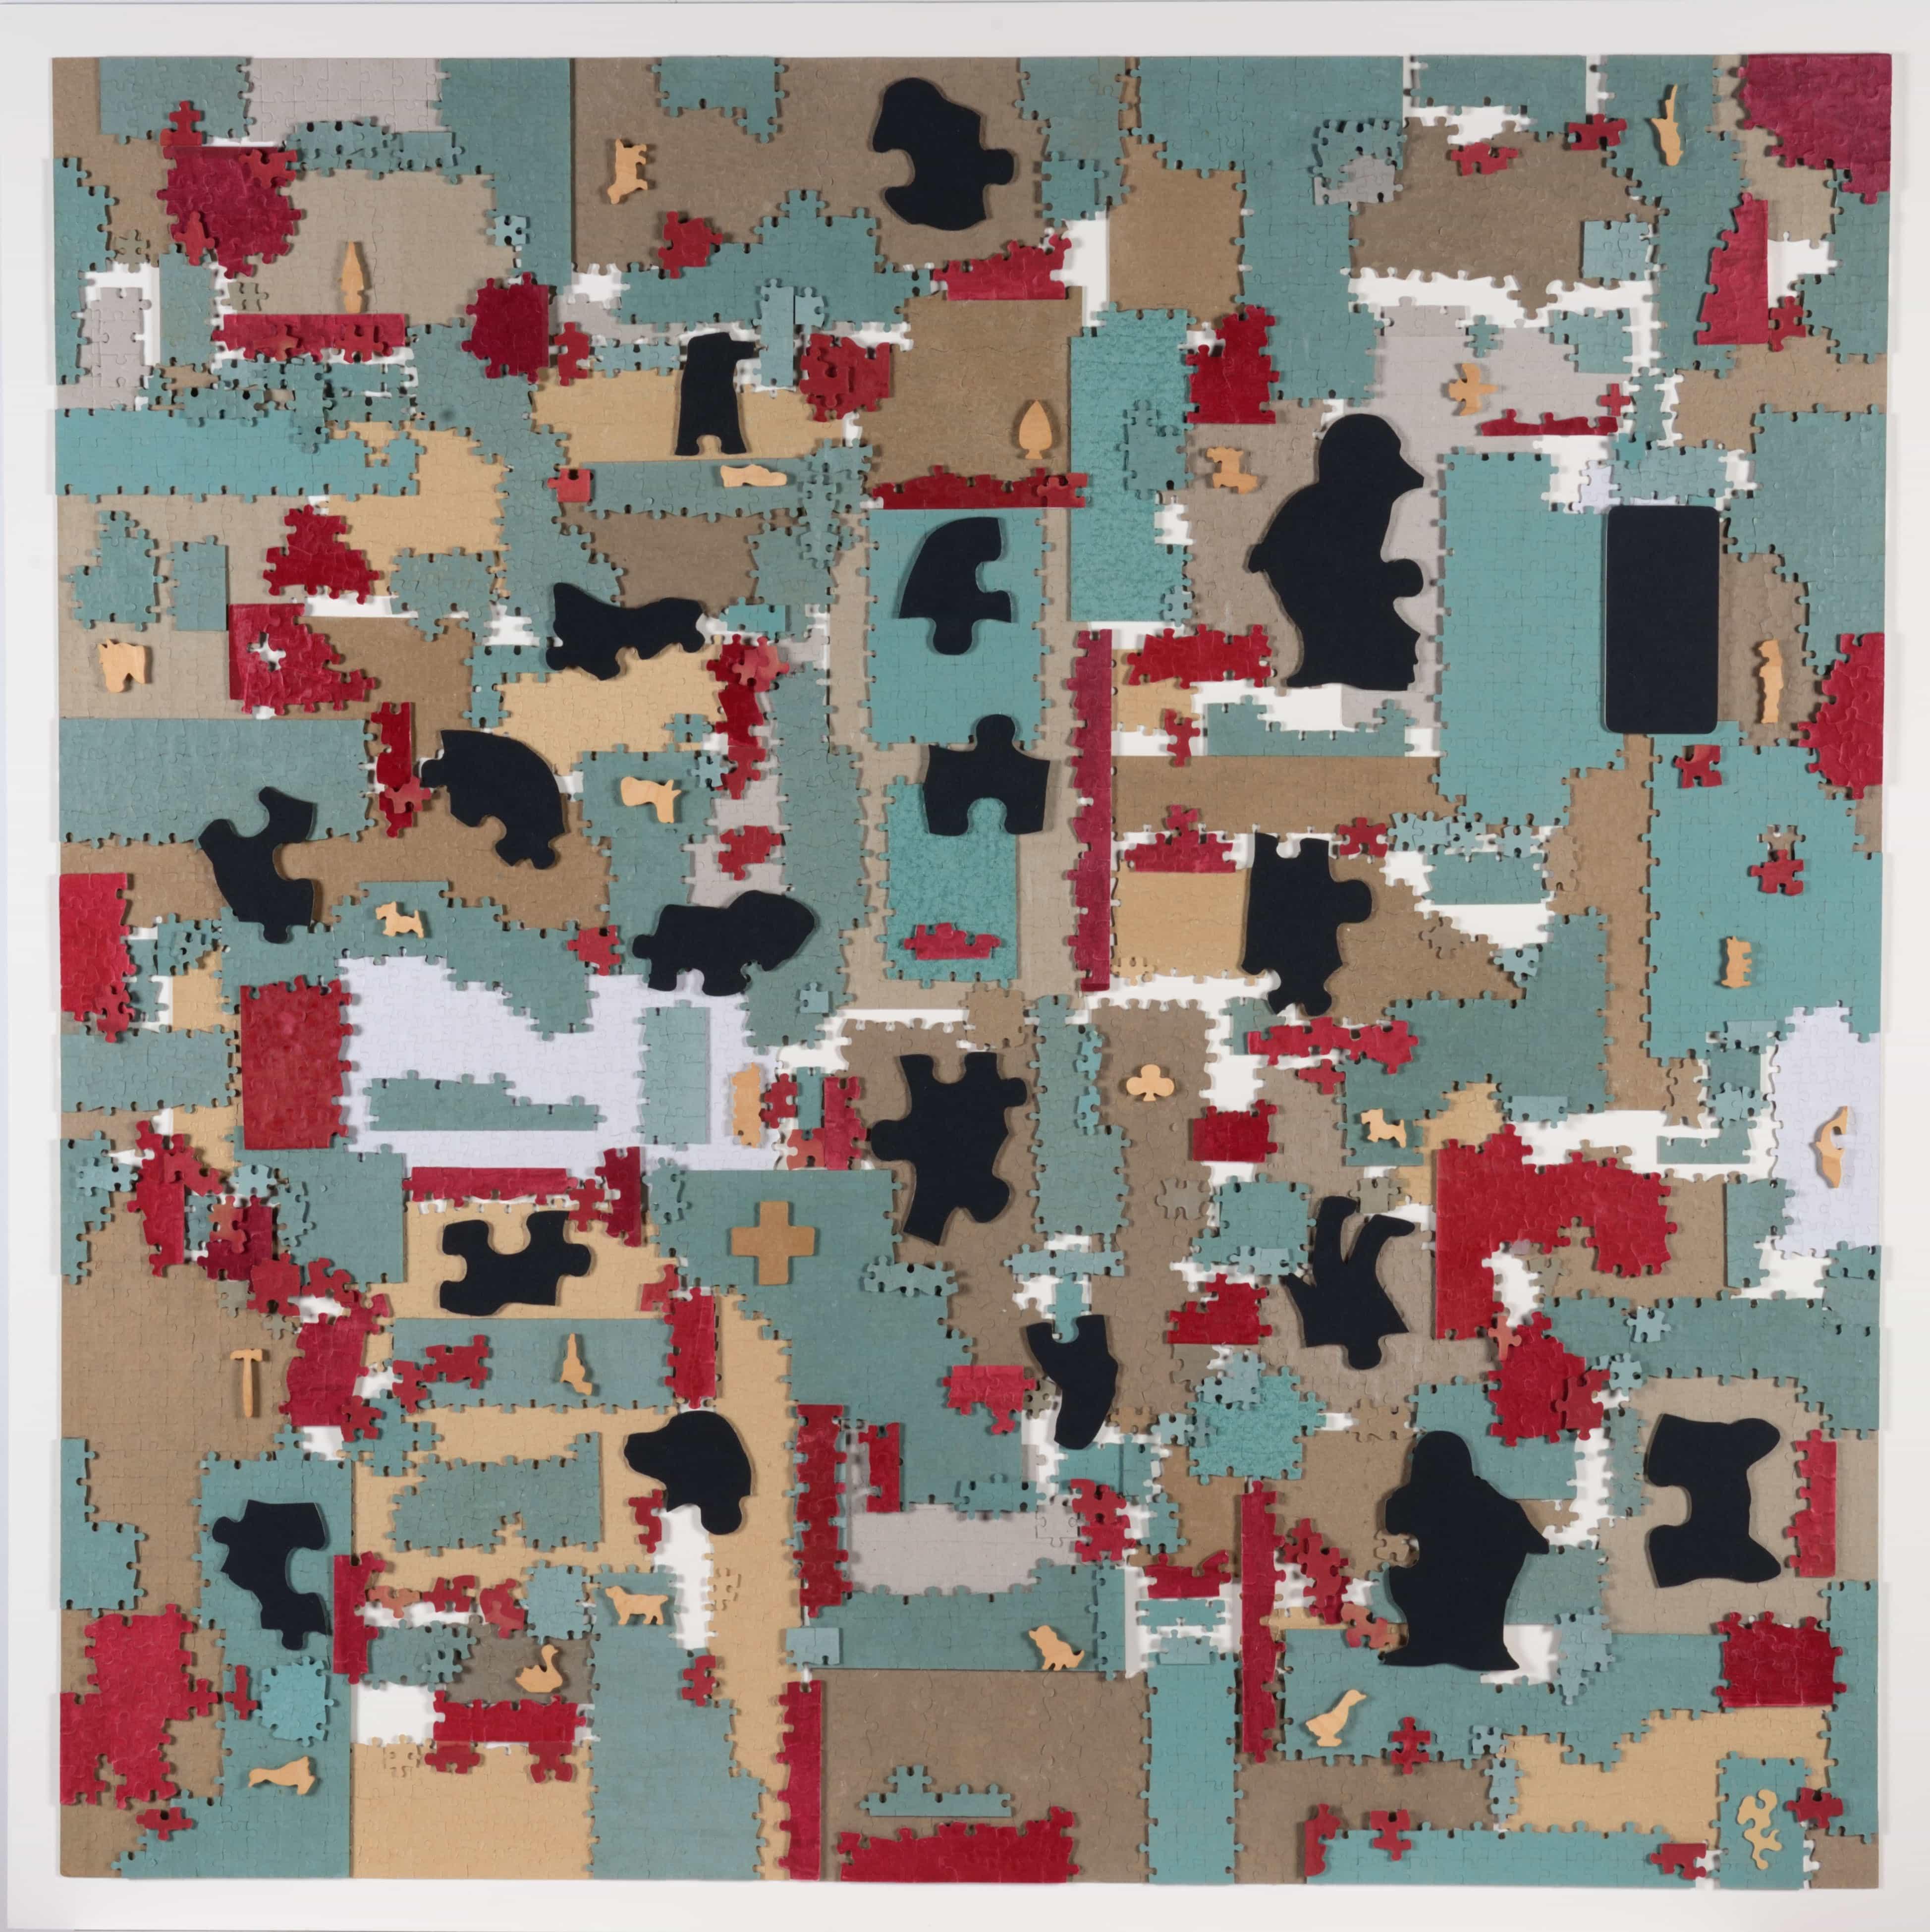 Andrew Seward, Les Moutons De Panurge